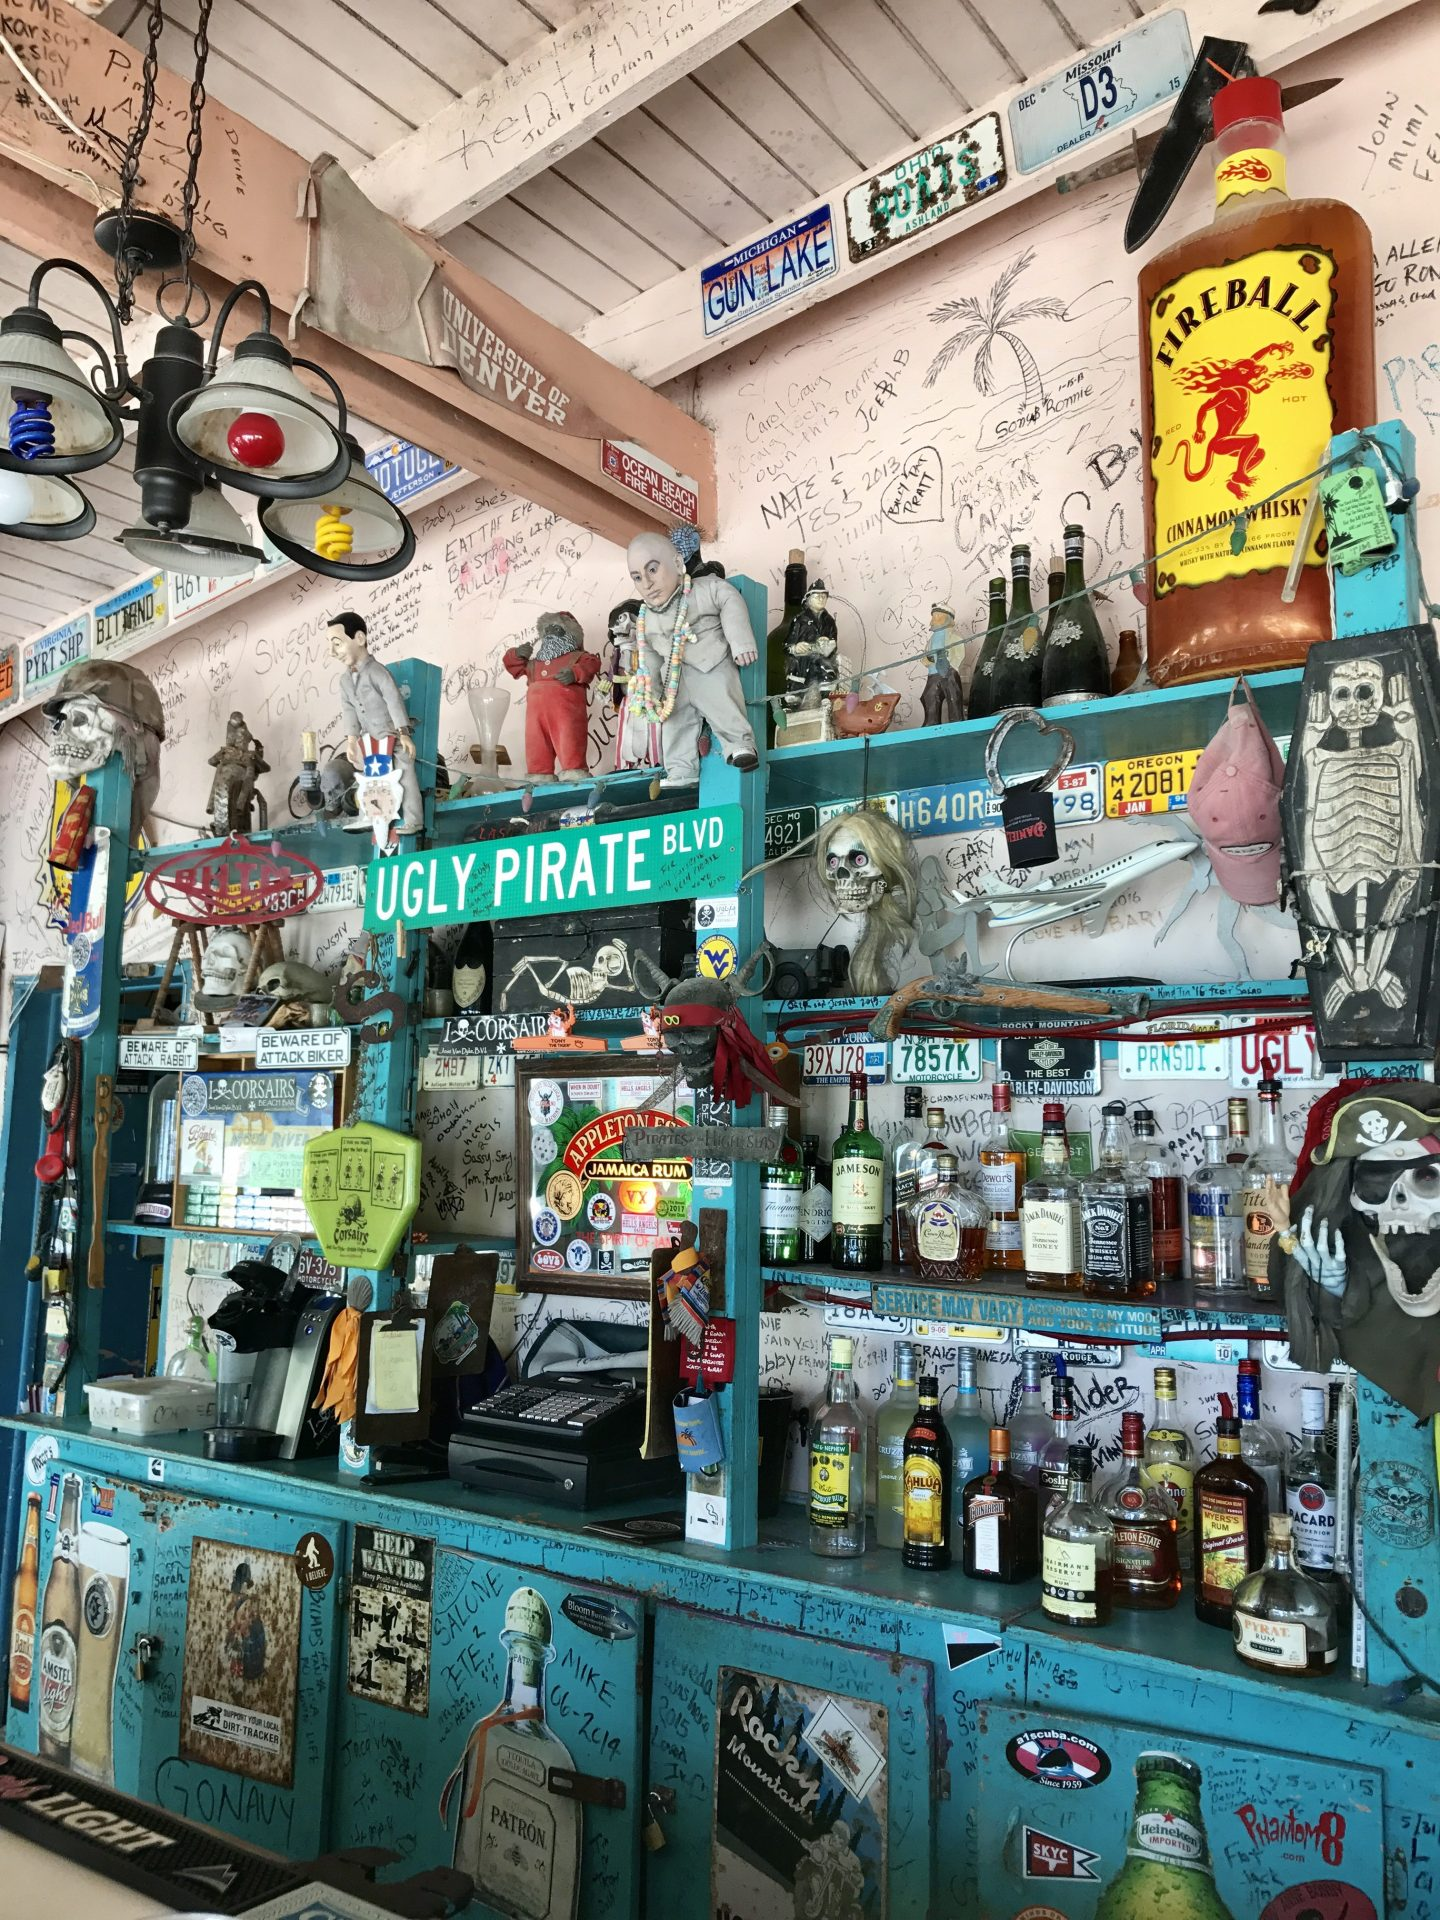 Corsairs Beach Bar & Restaurant, Jost Van Dyke